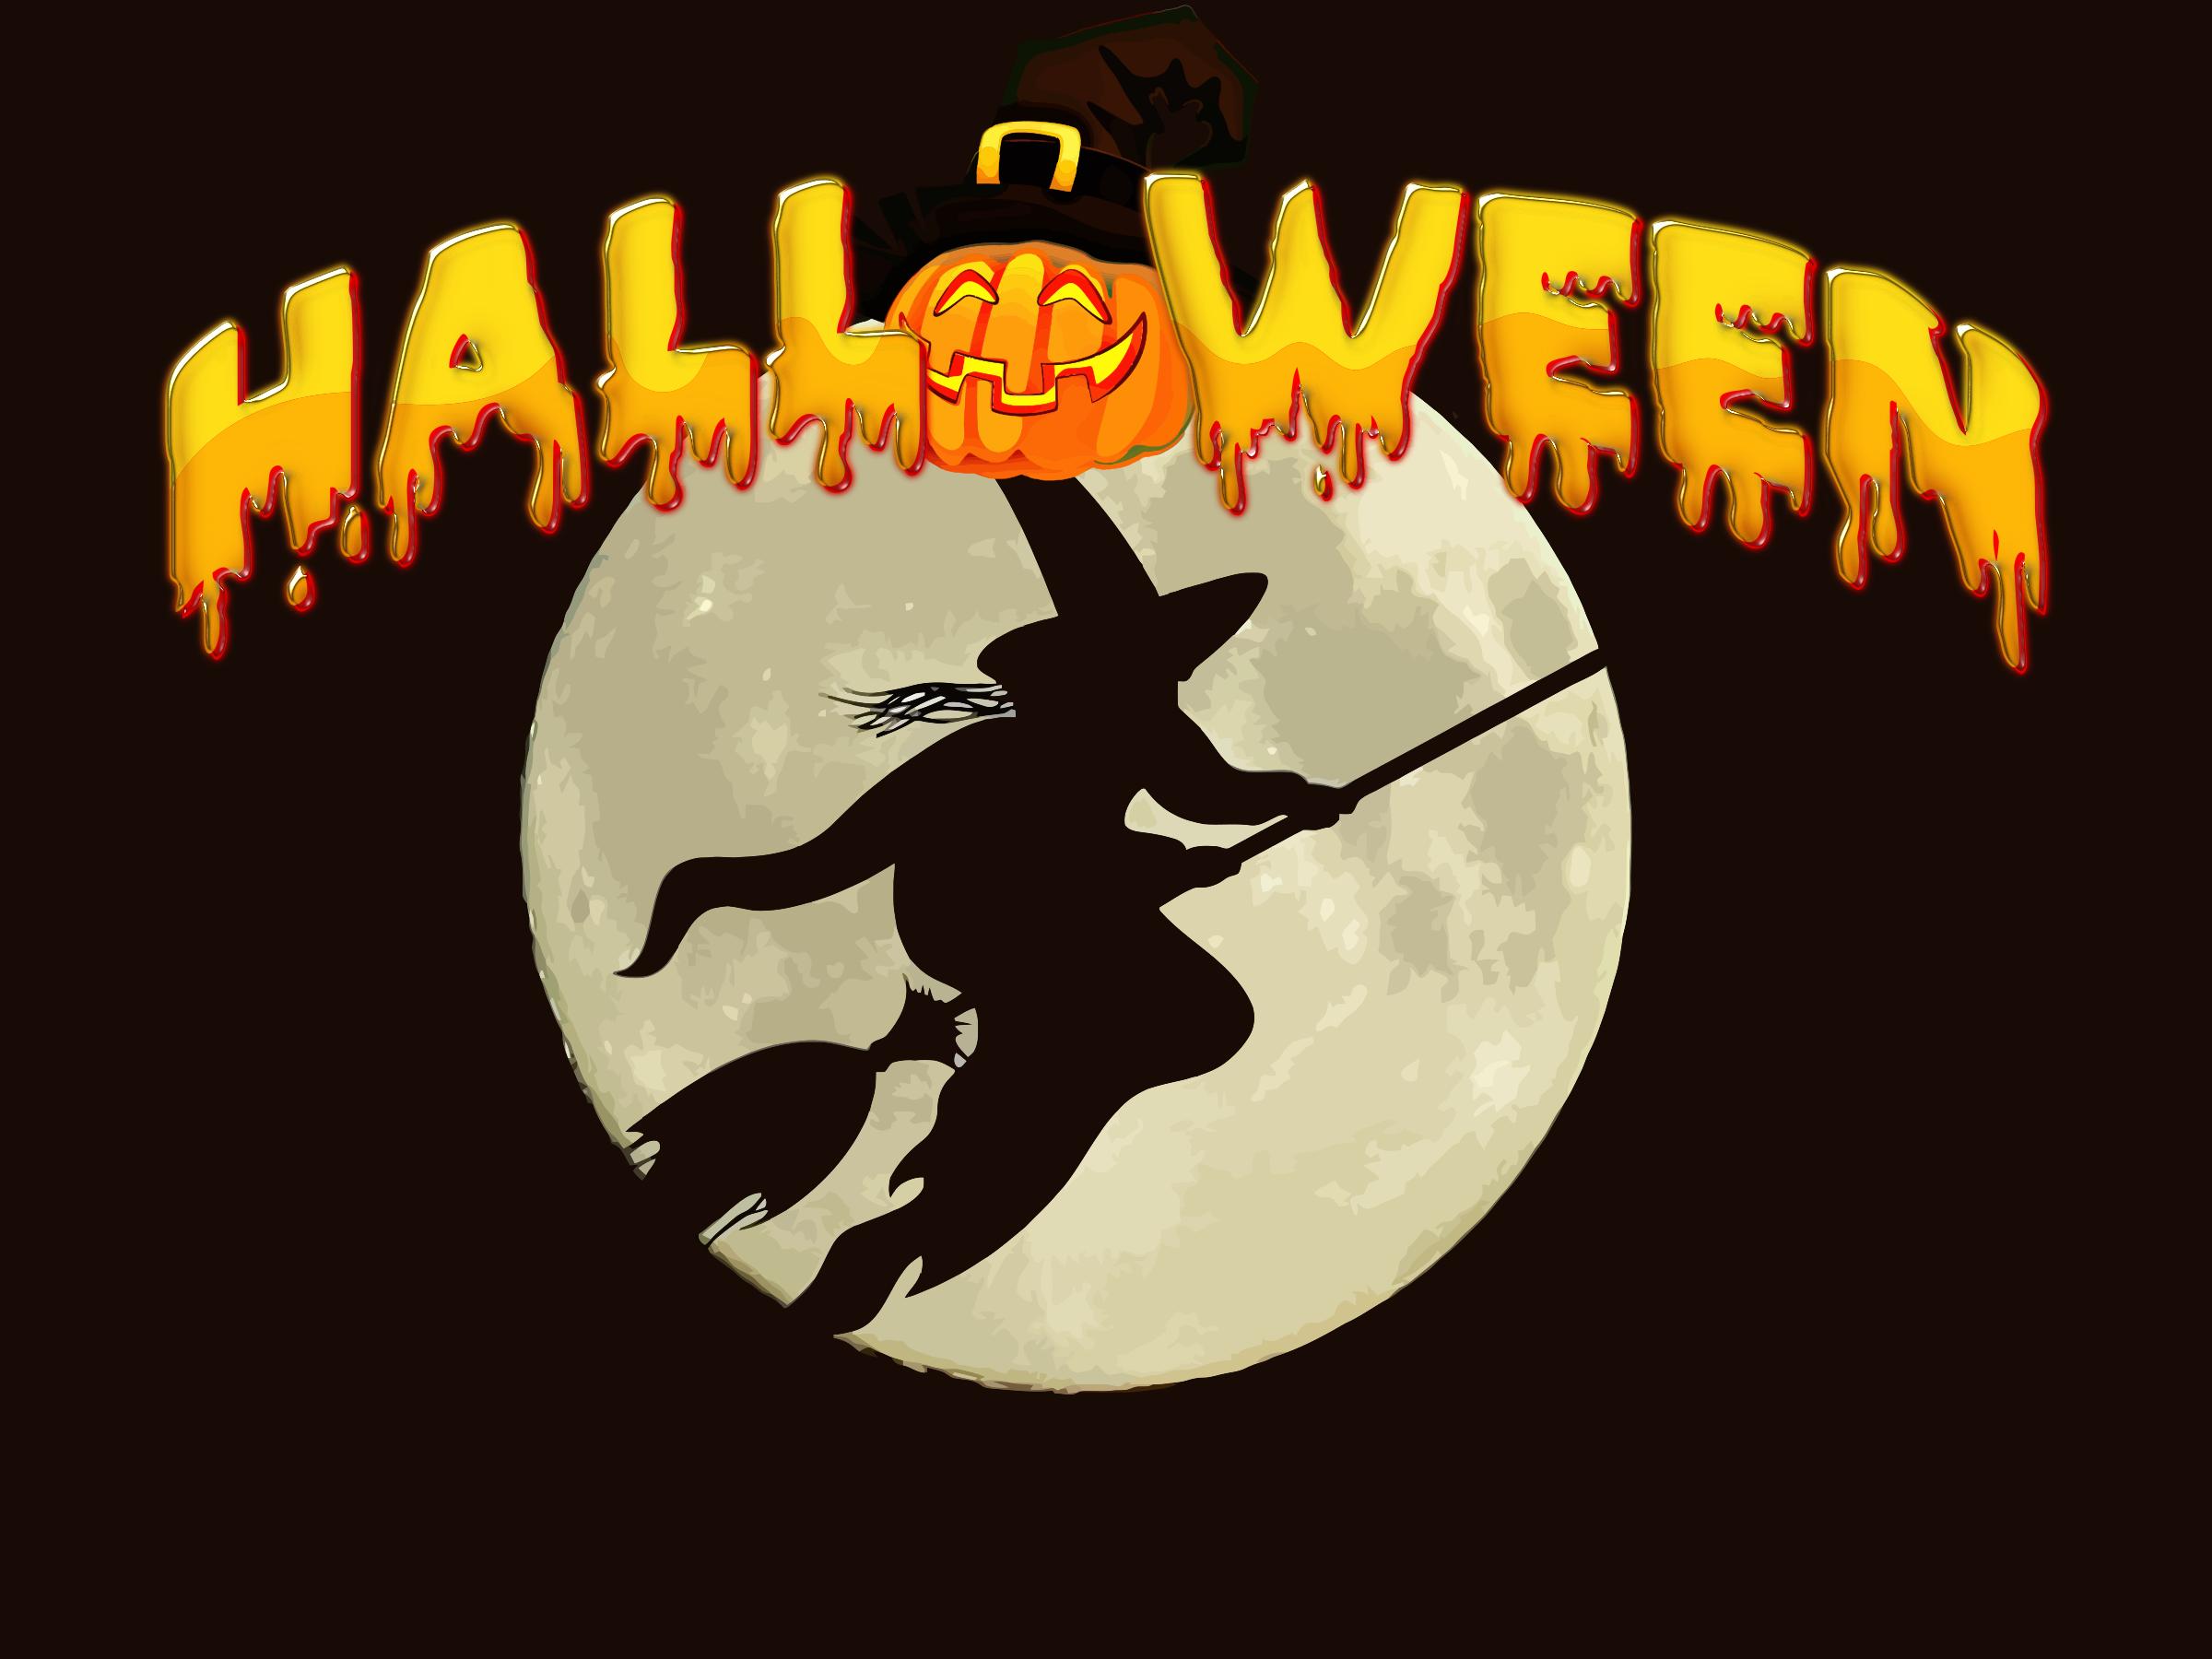 Clipart - Halloween Background 2